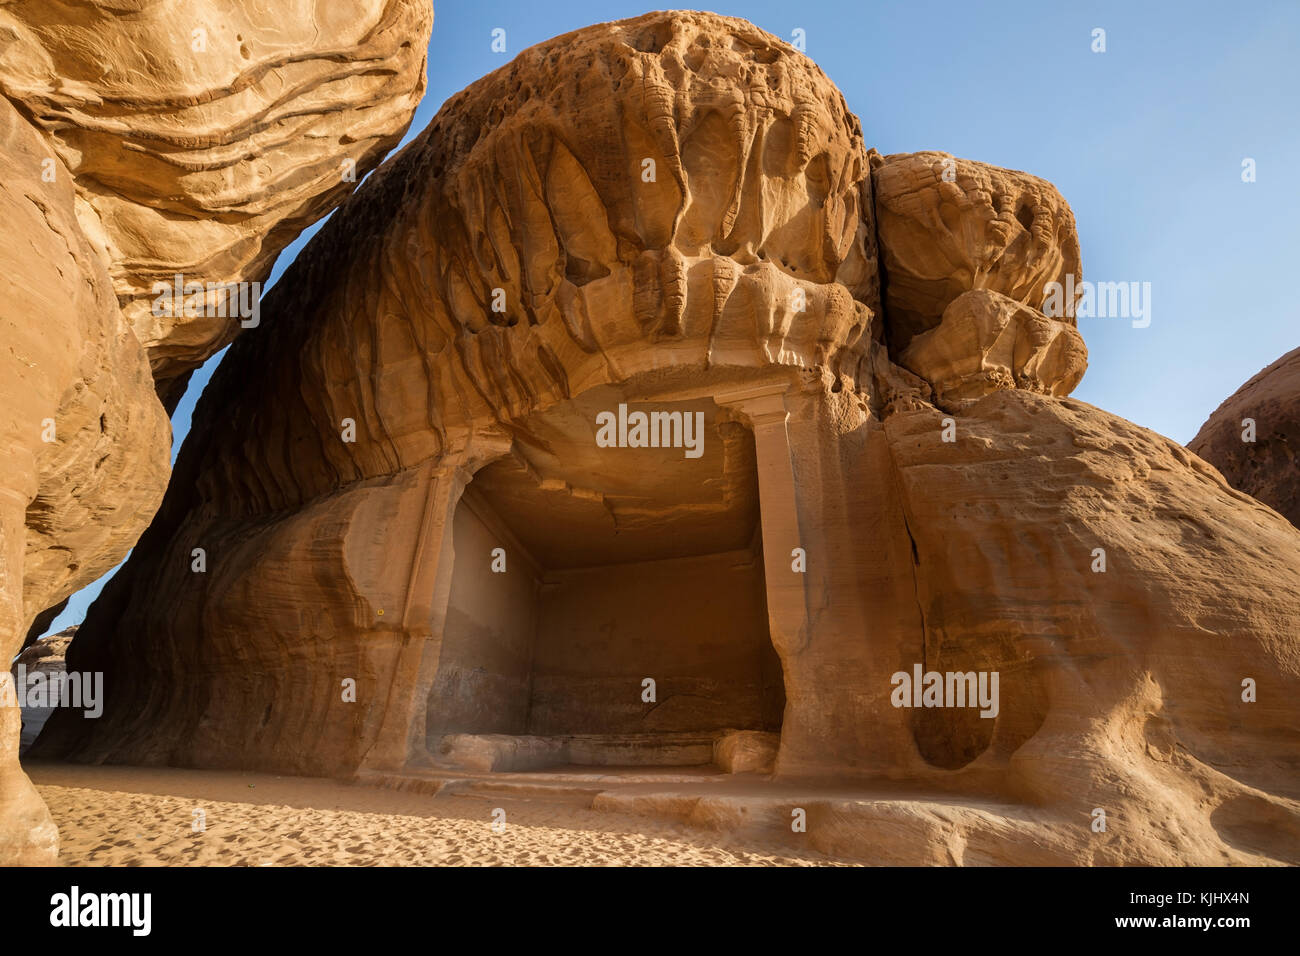 Rock formation and carving, Mada'in Saleh, Al Madinah, Al-Hejaz, Saudi Arabia - Stock Image